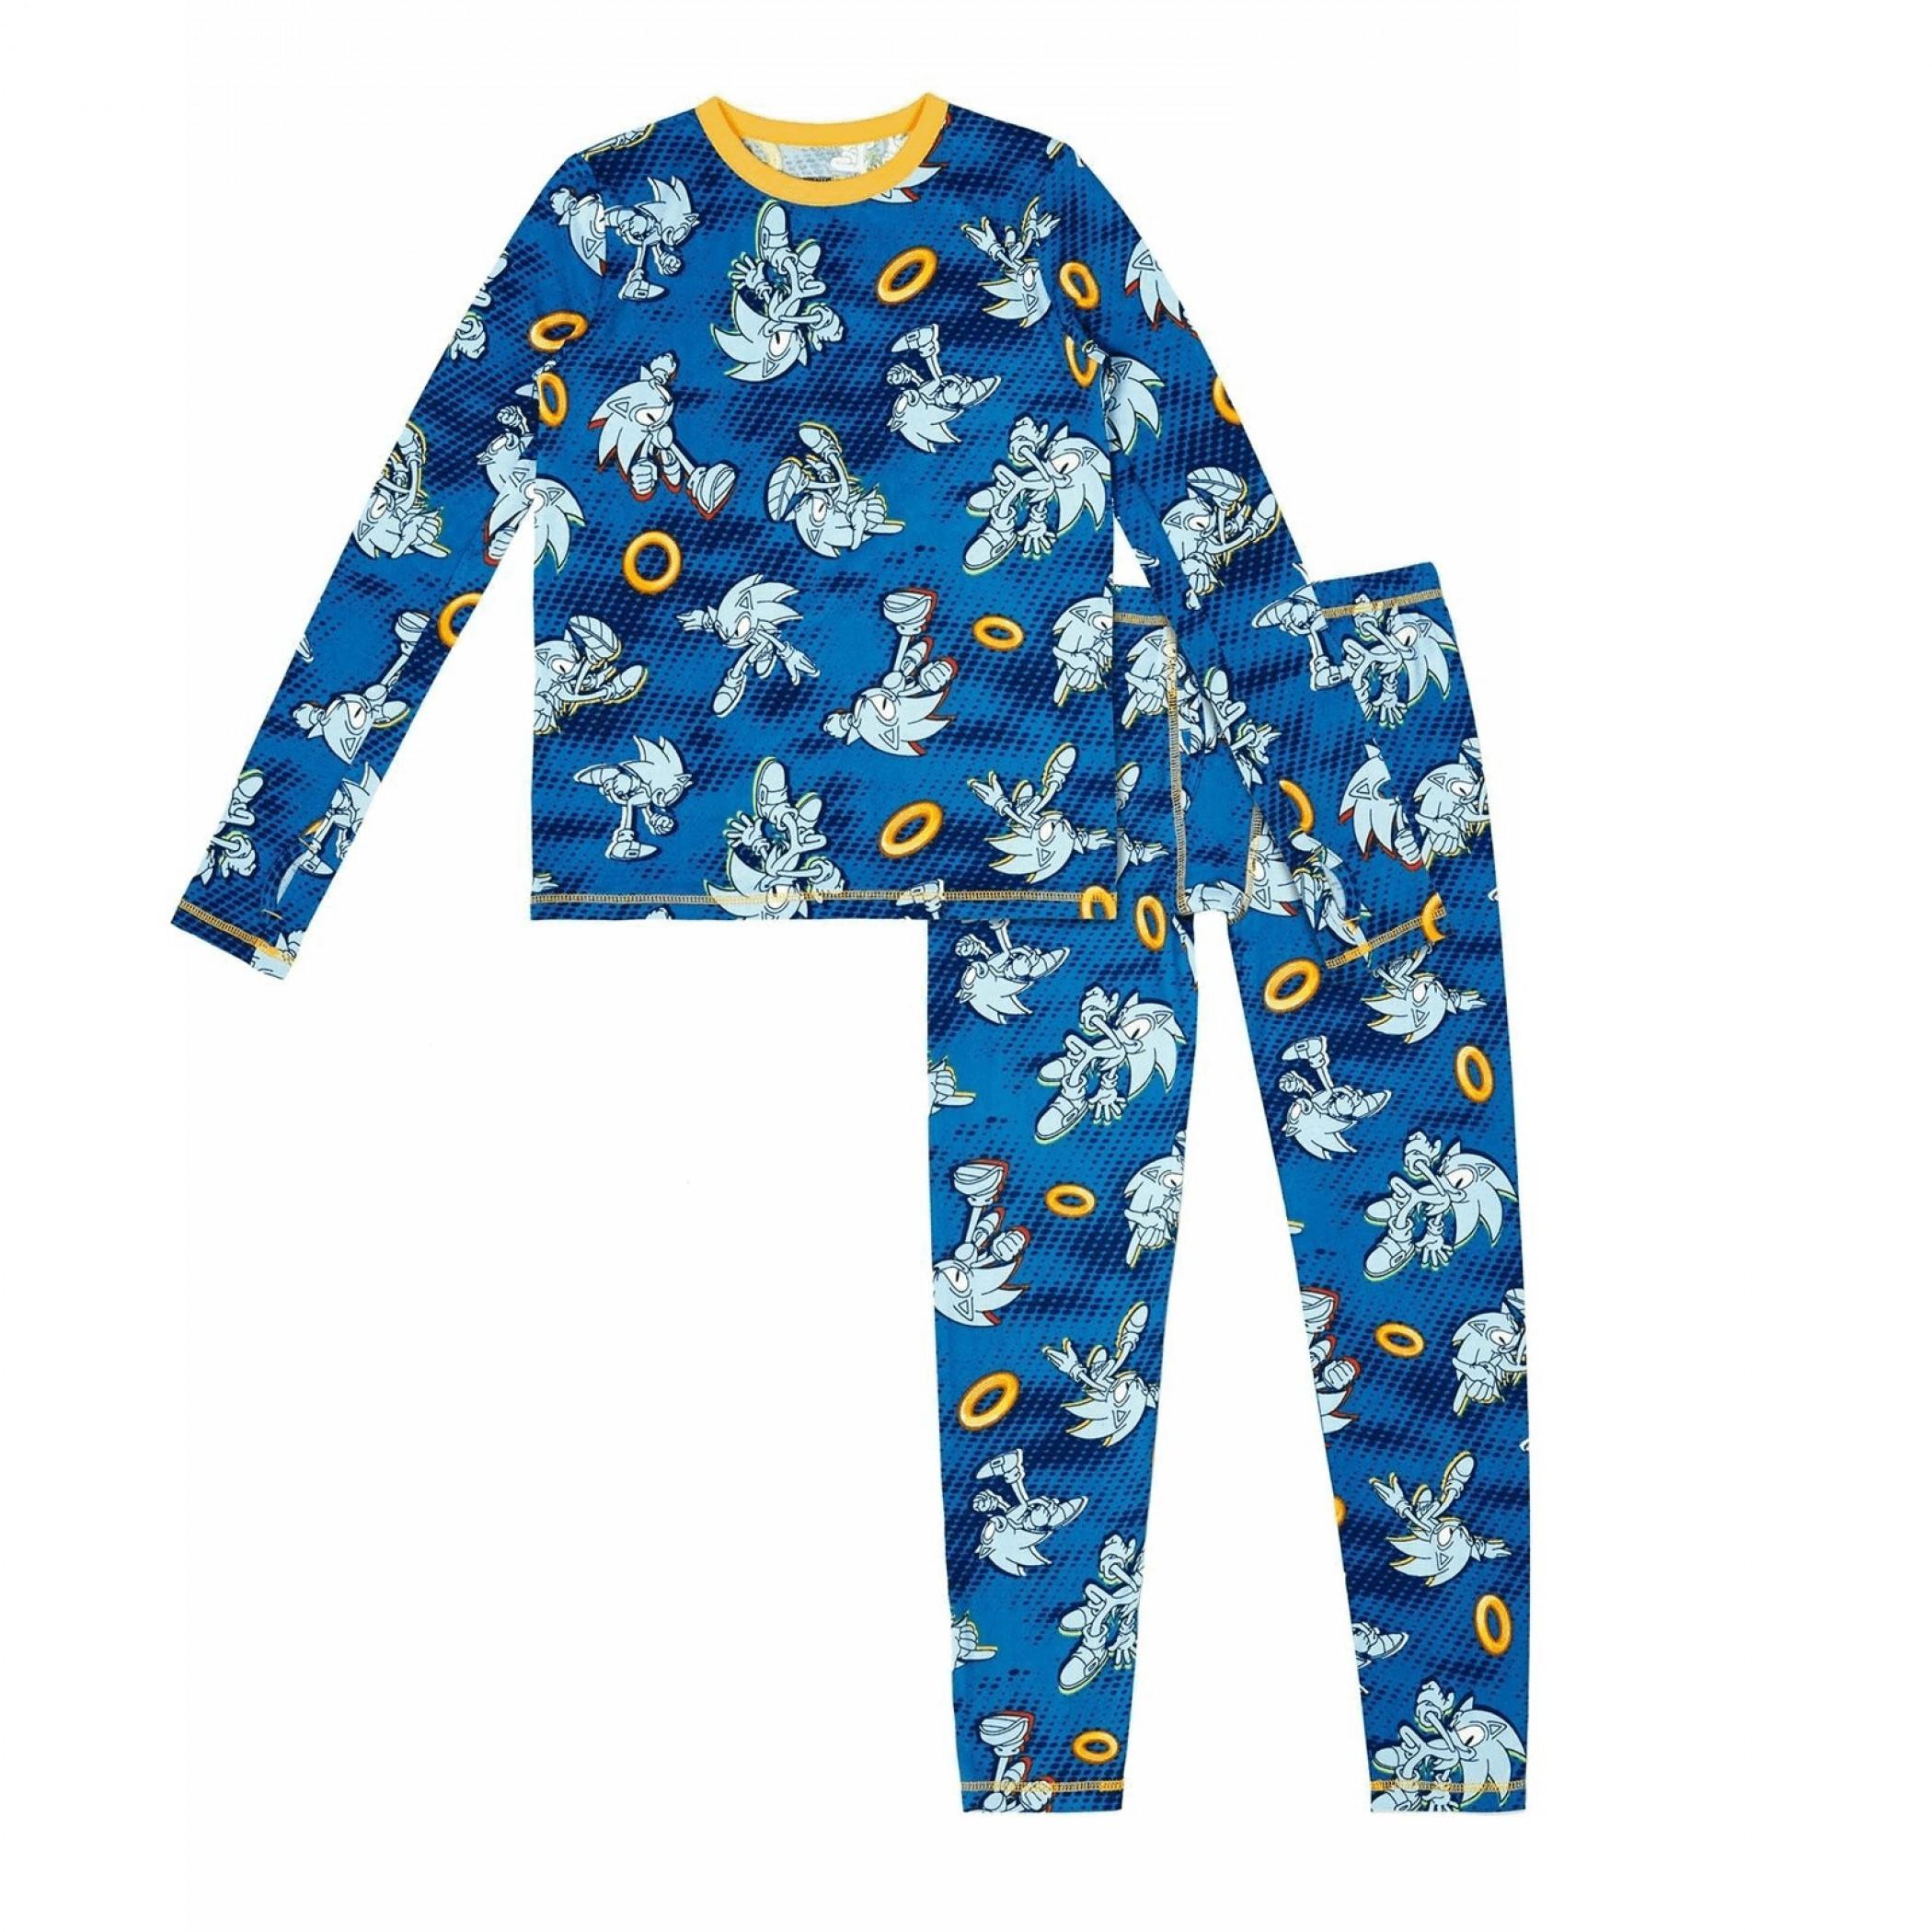 Sonic the Hedgehog 2-Piece Insulating Warm Pajama Set